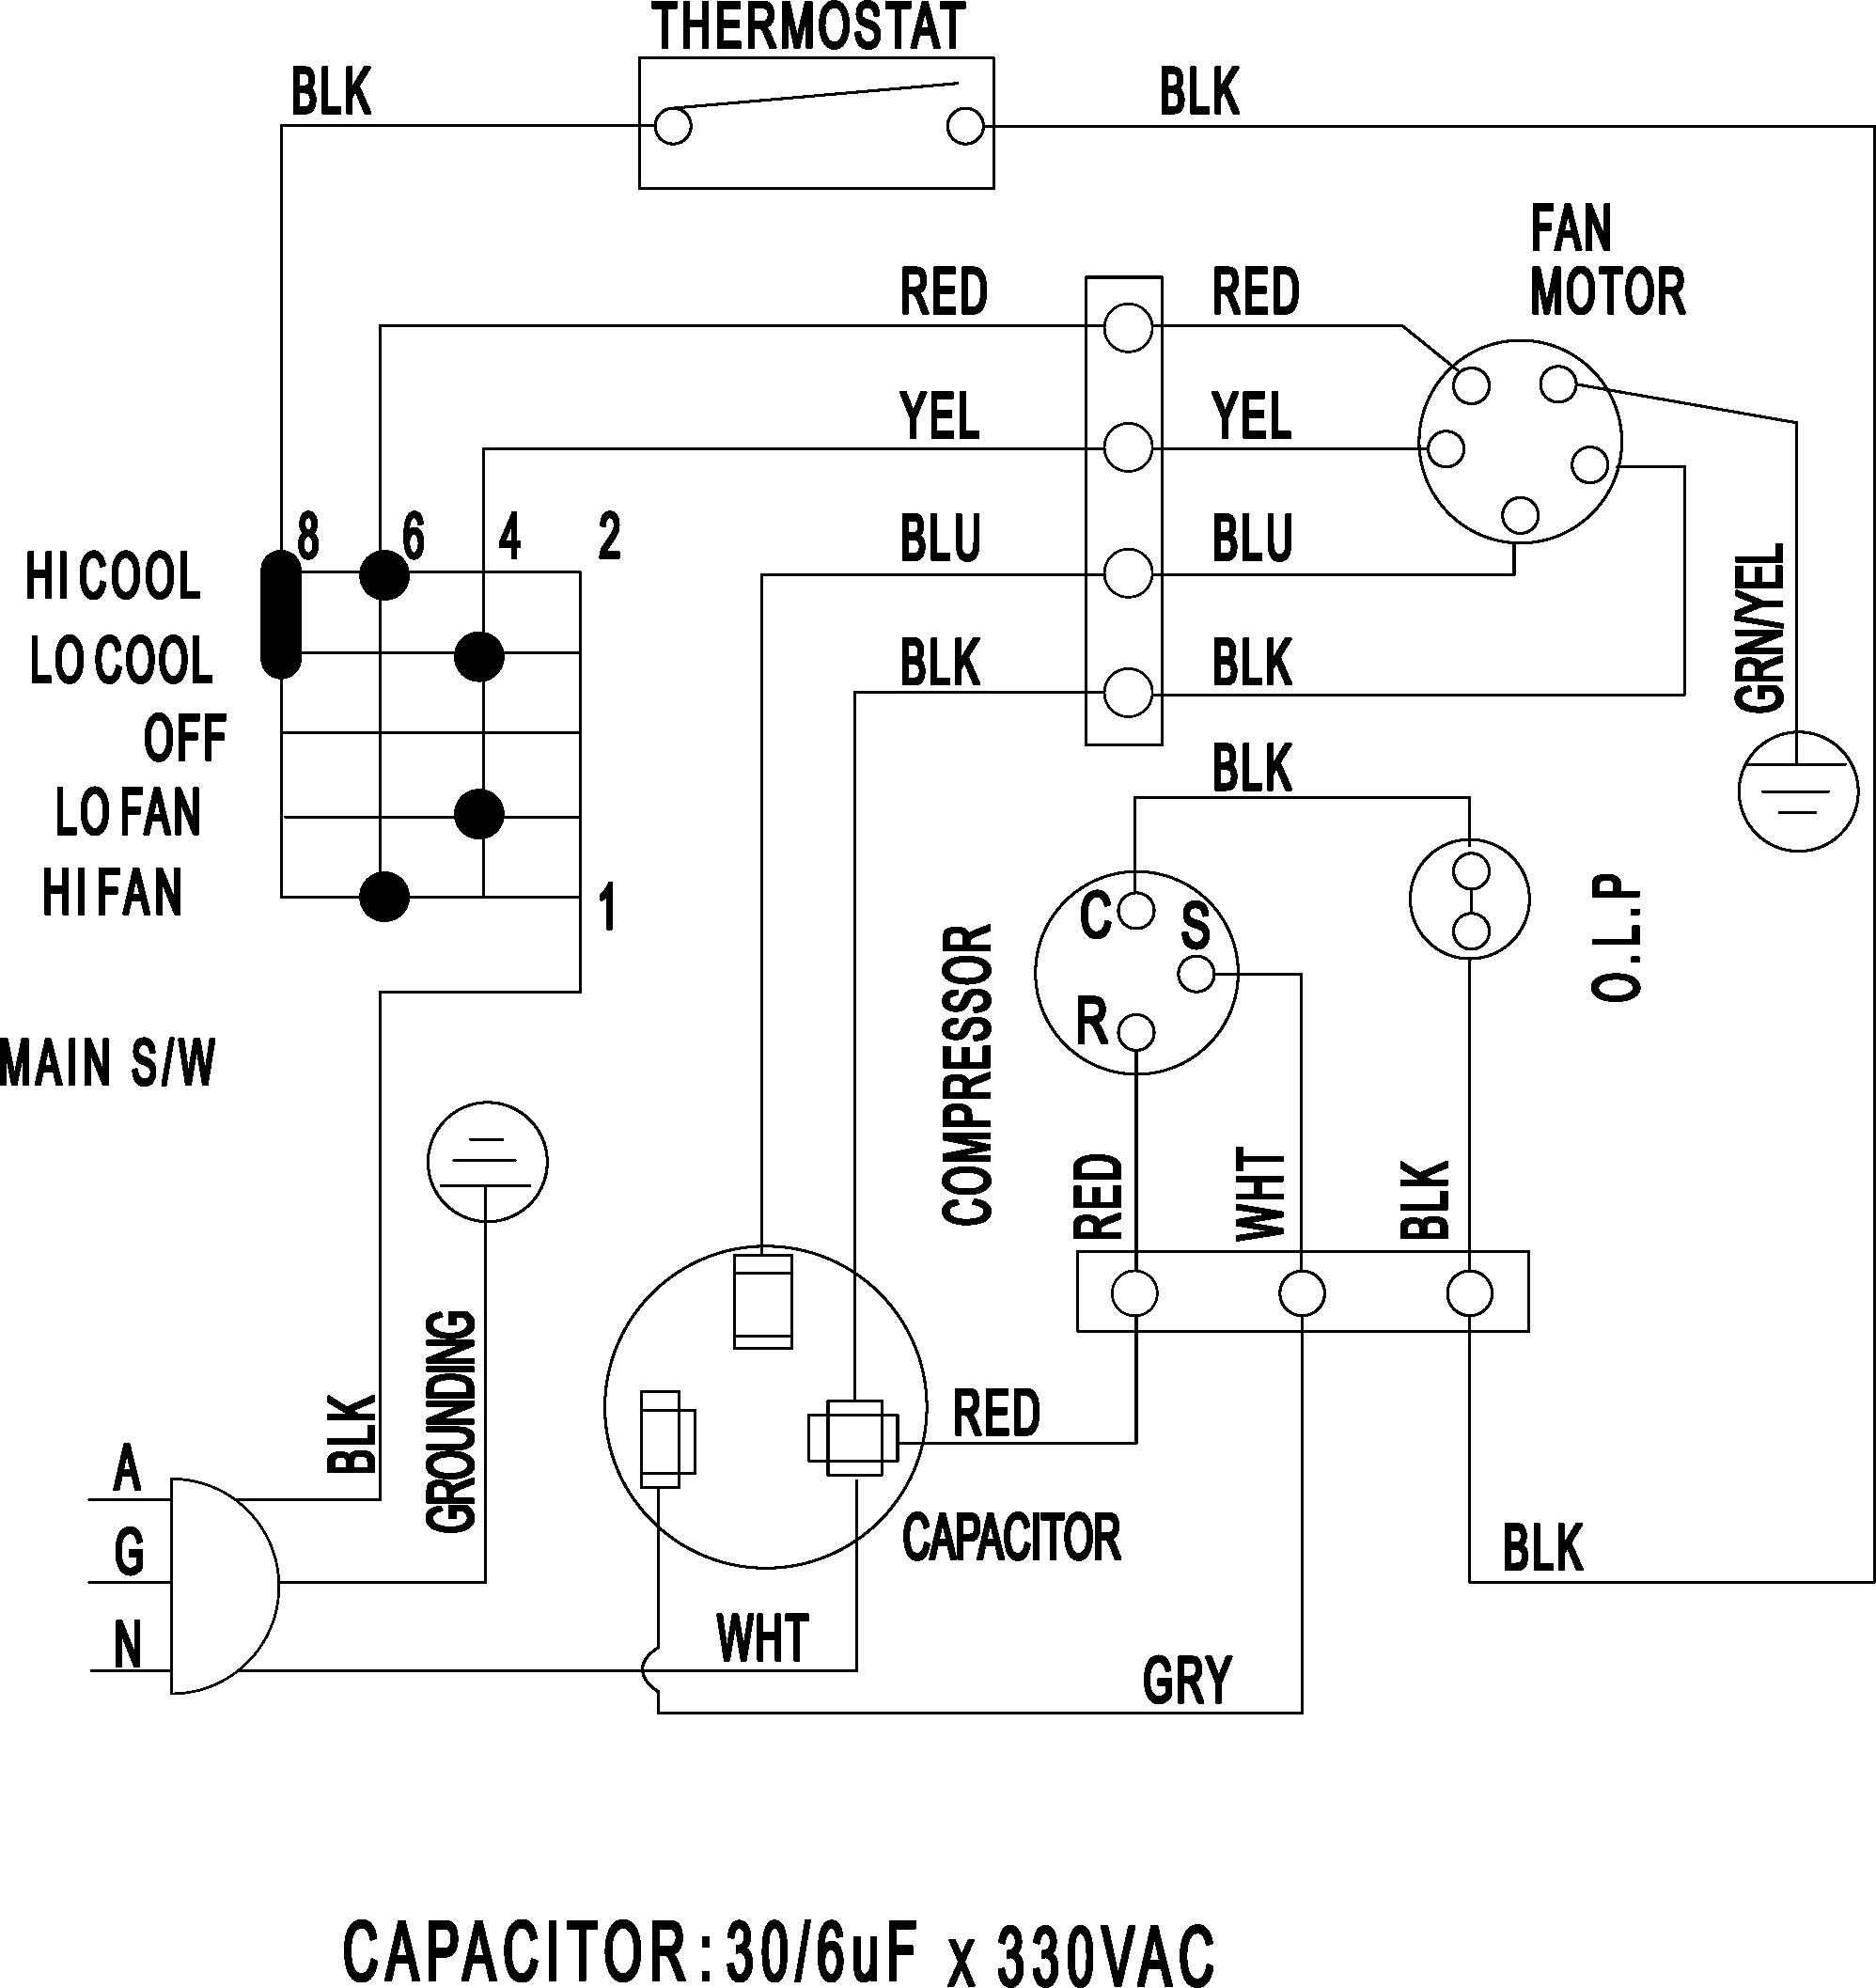 Ac Unit Wiring Diagram - Data Wiring Diagram Today - Ac Unit Wiring Diagram